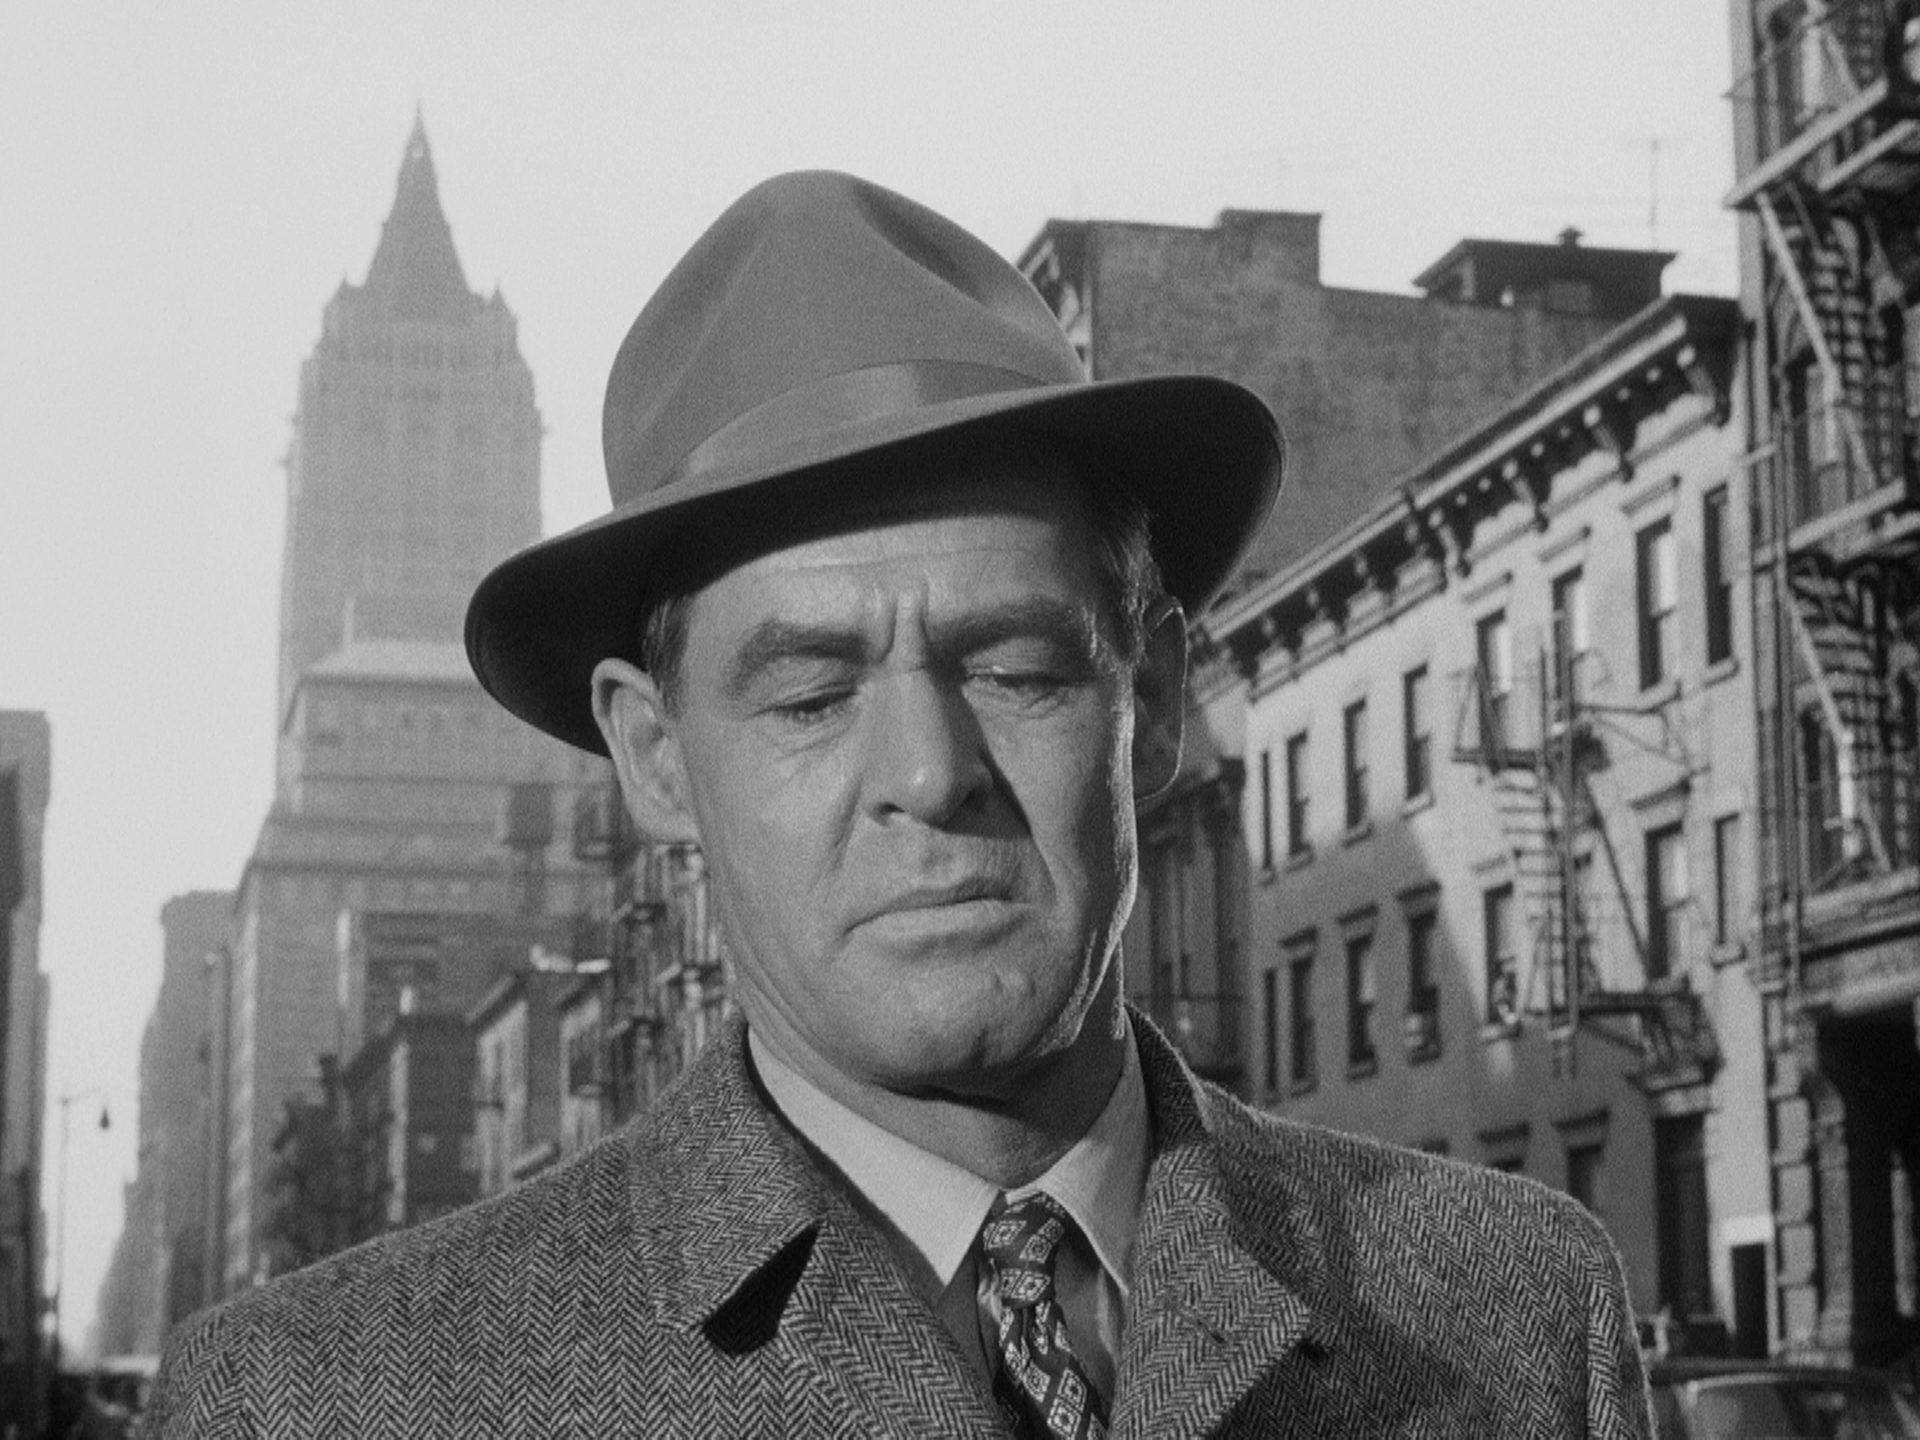 Szene aus 'Wenig Chancen für morgen(1959)', Copyright: HarBel Productions